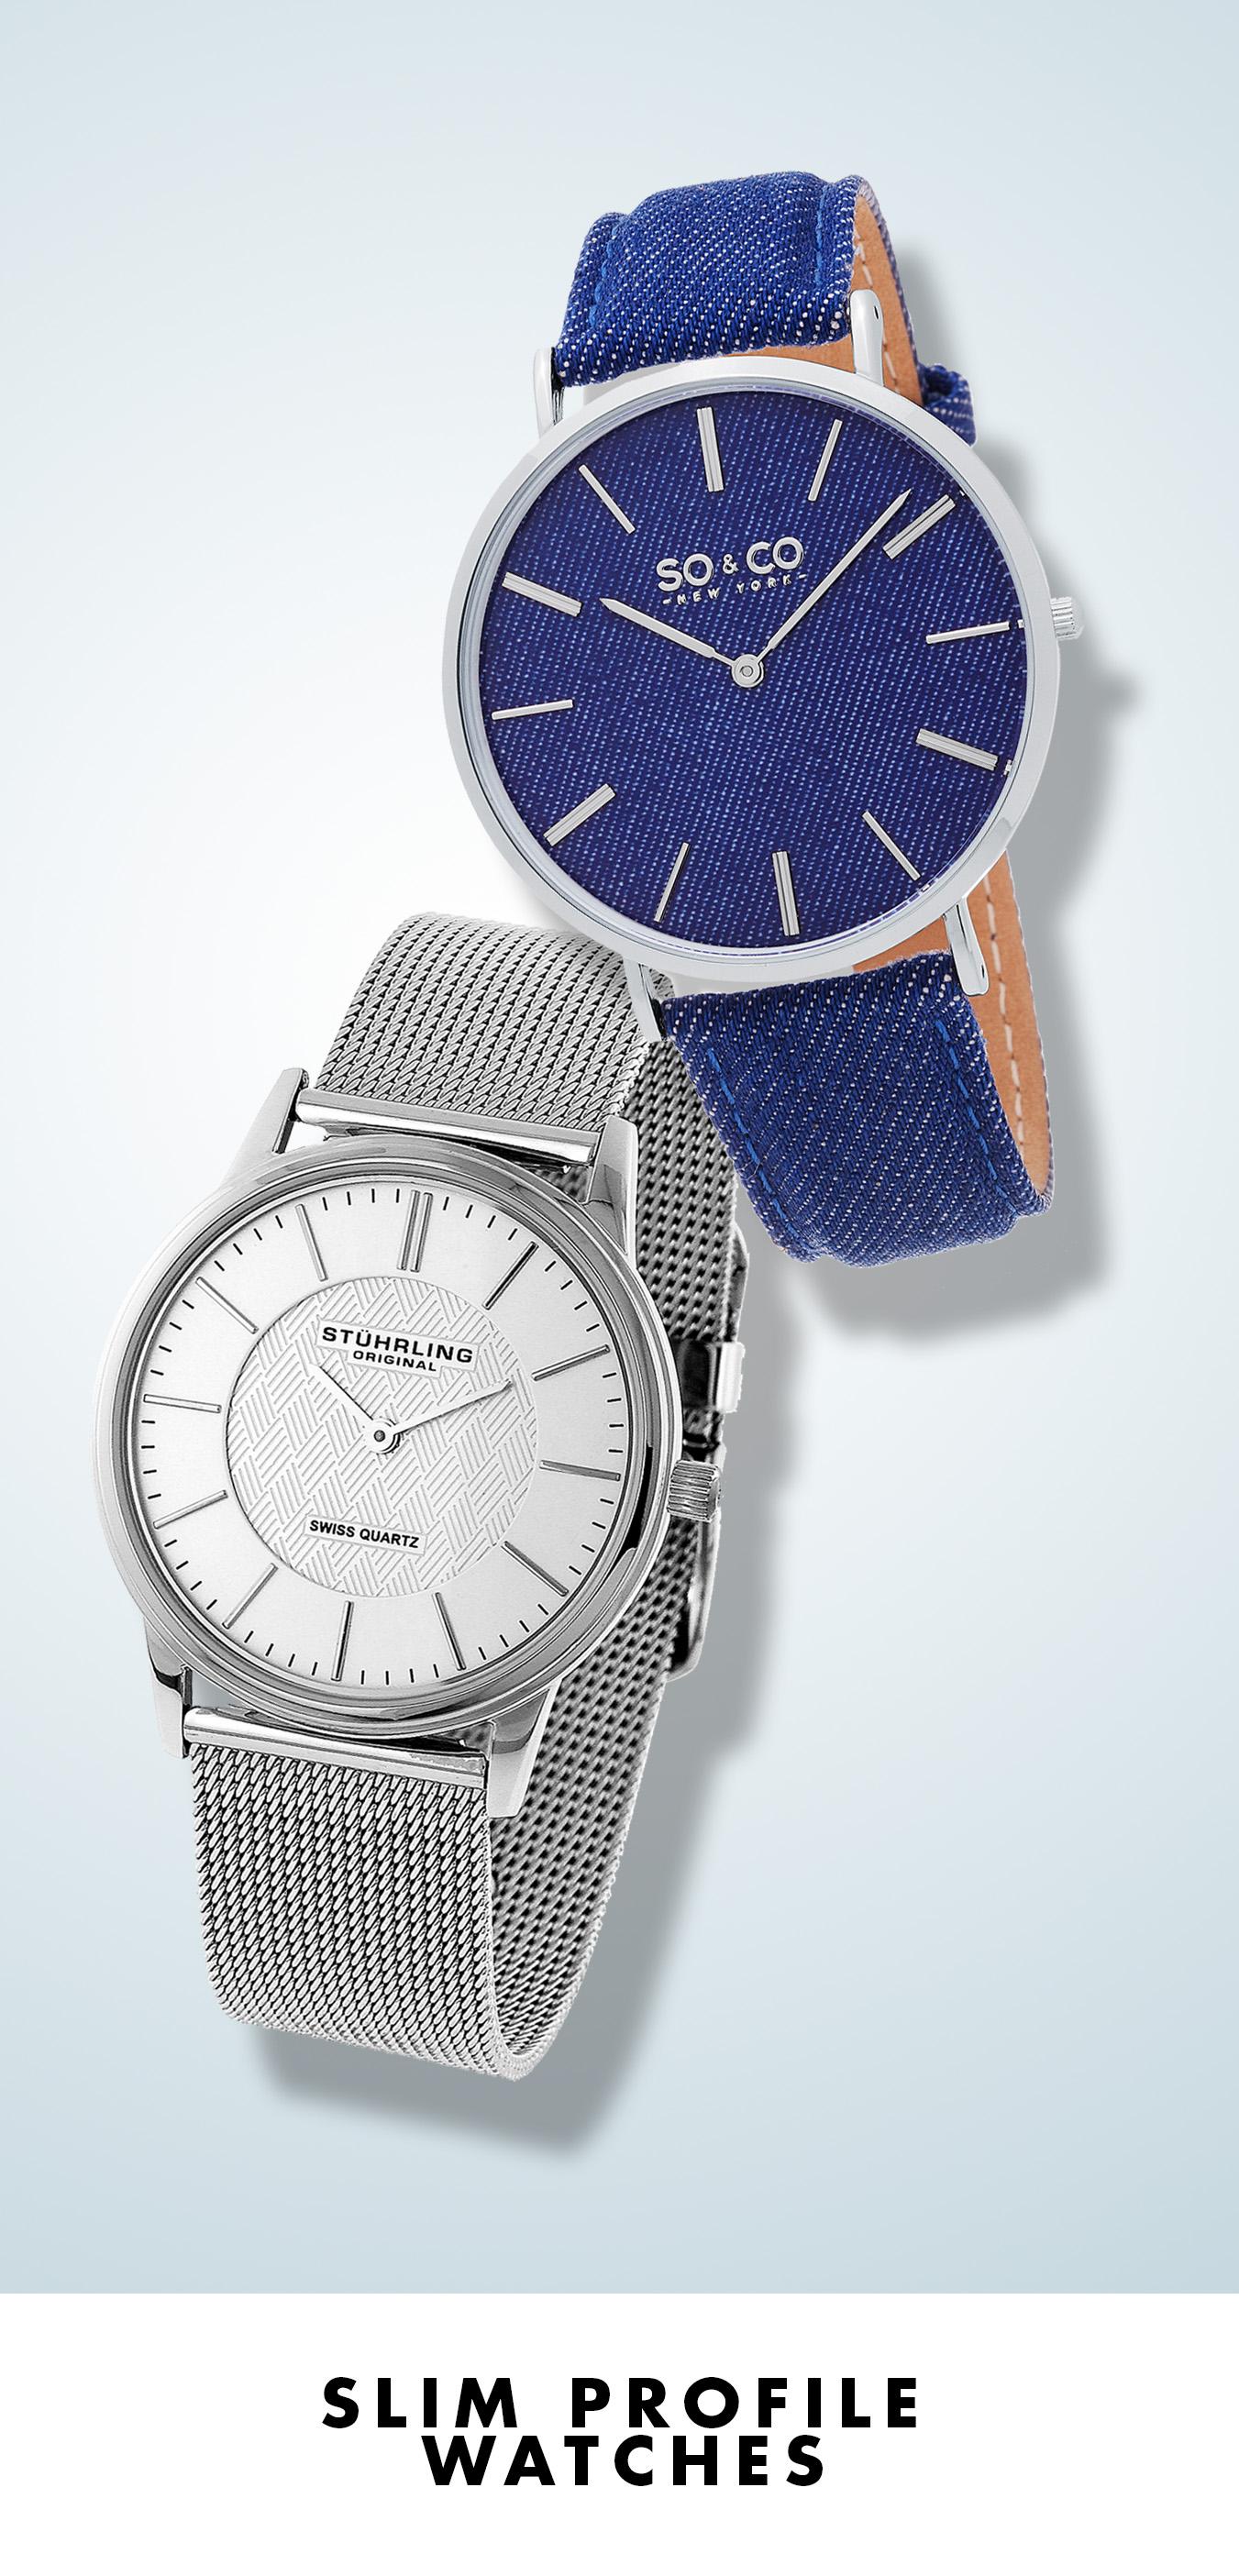 Slim Profile Watches